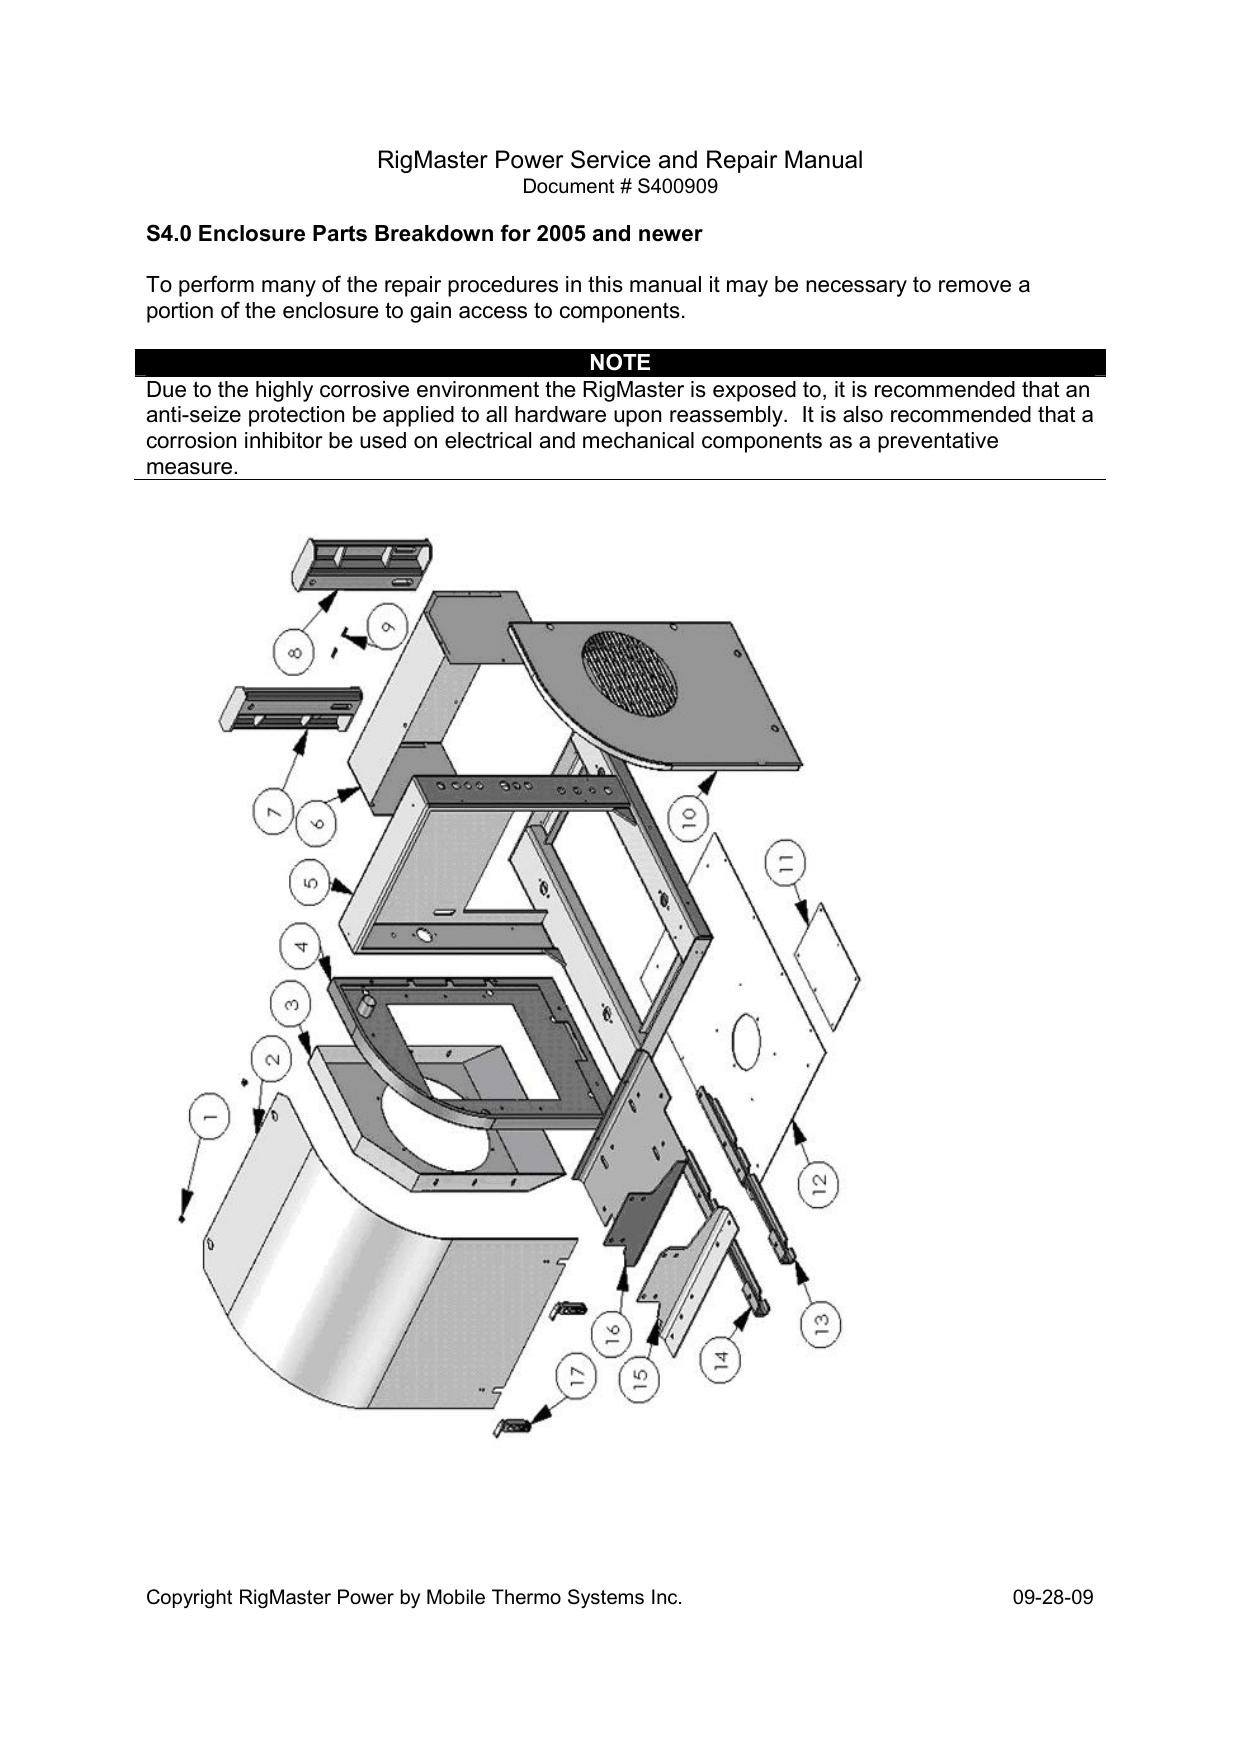 Rigmaster Generator Wiring Diagram : Rigmaster generator wiring diagram library